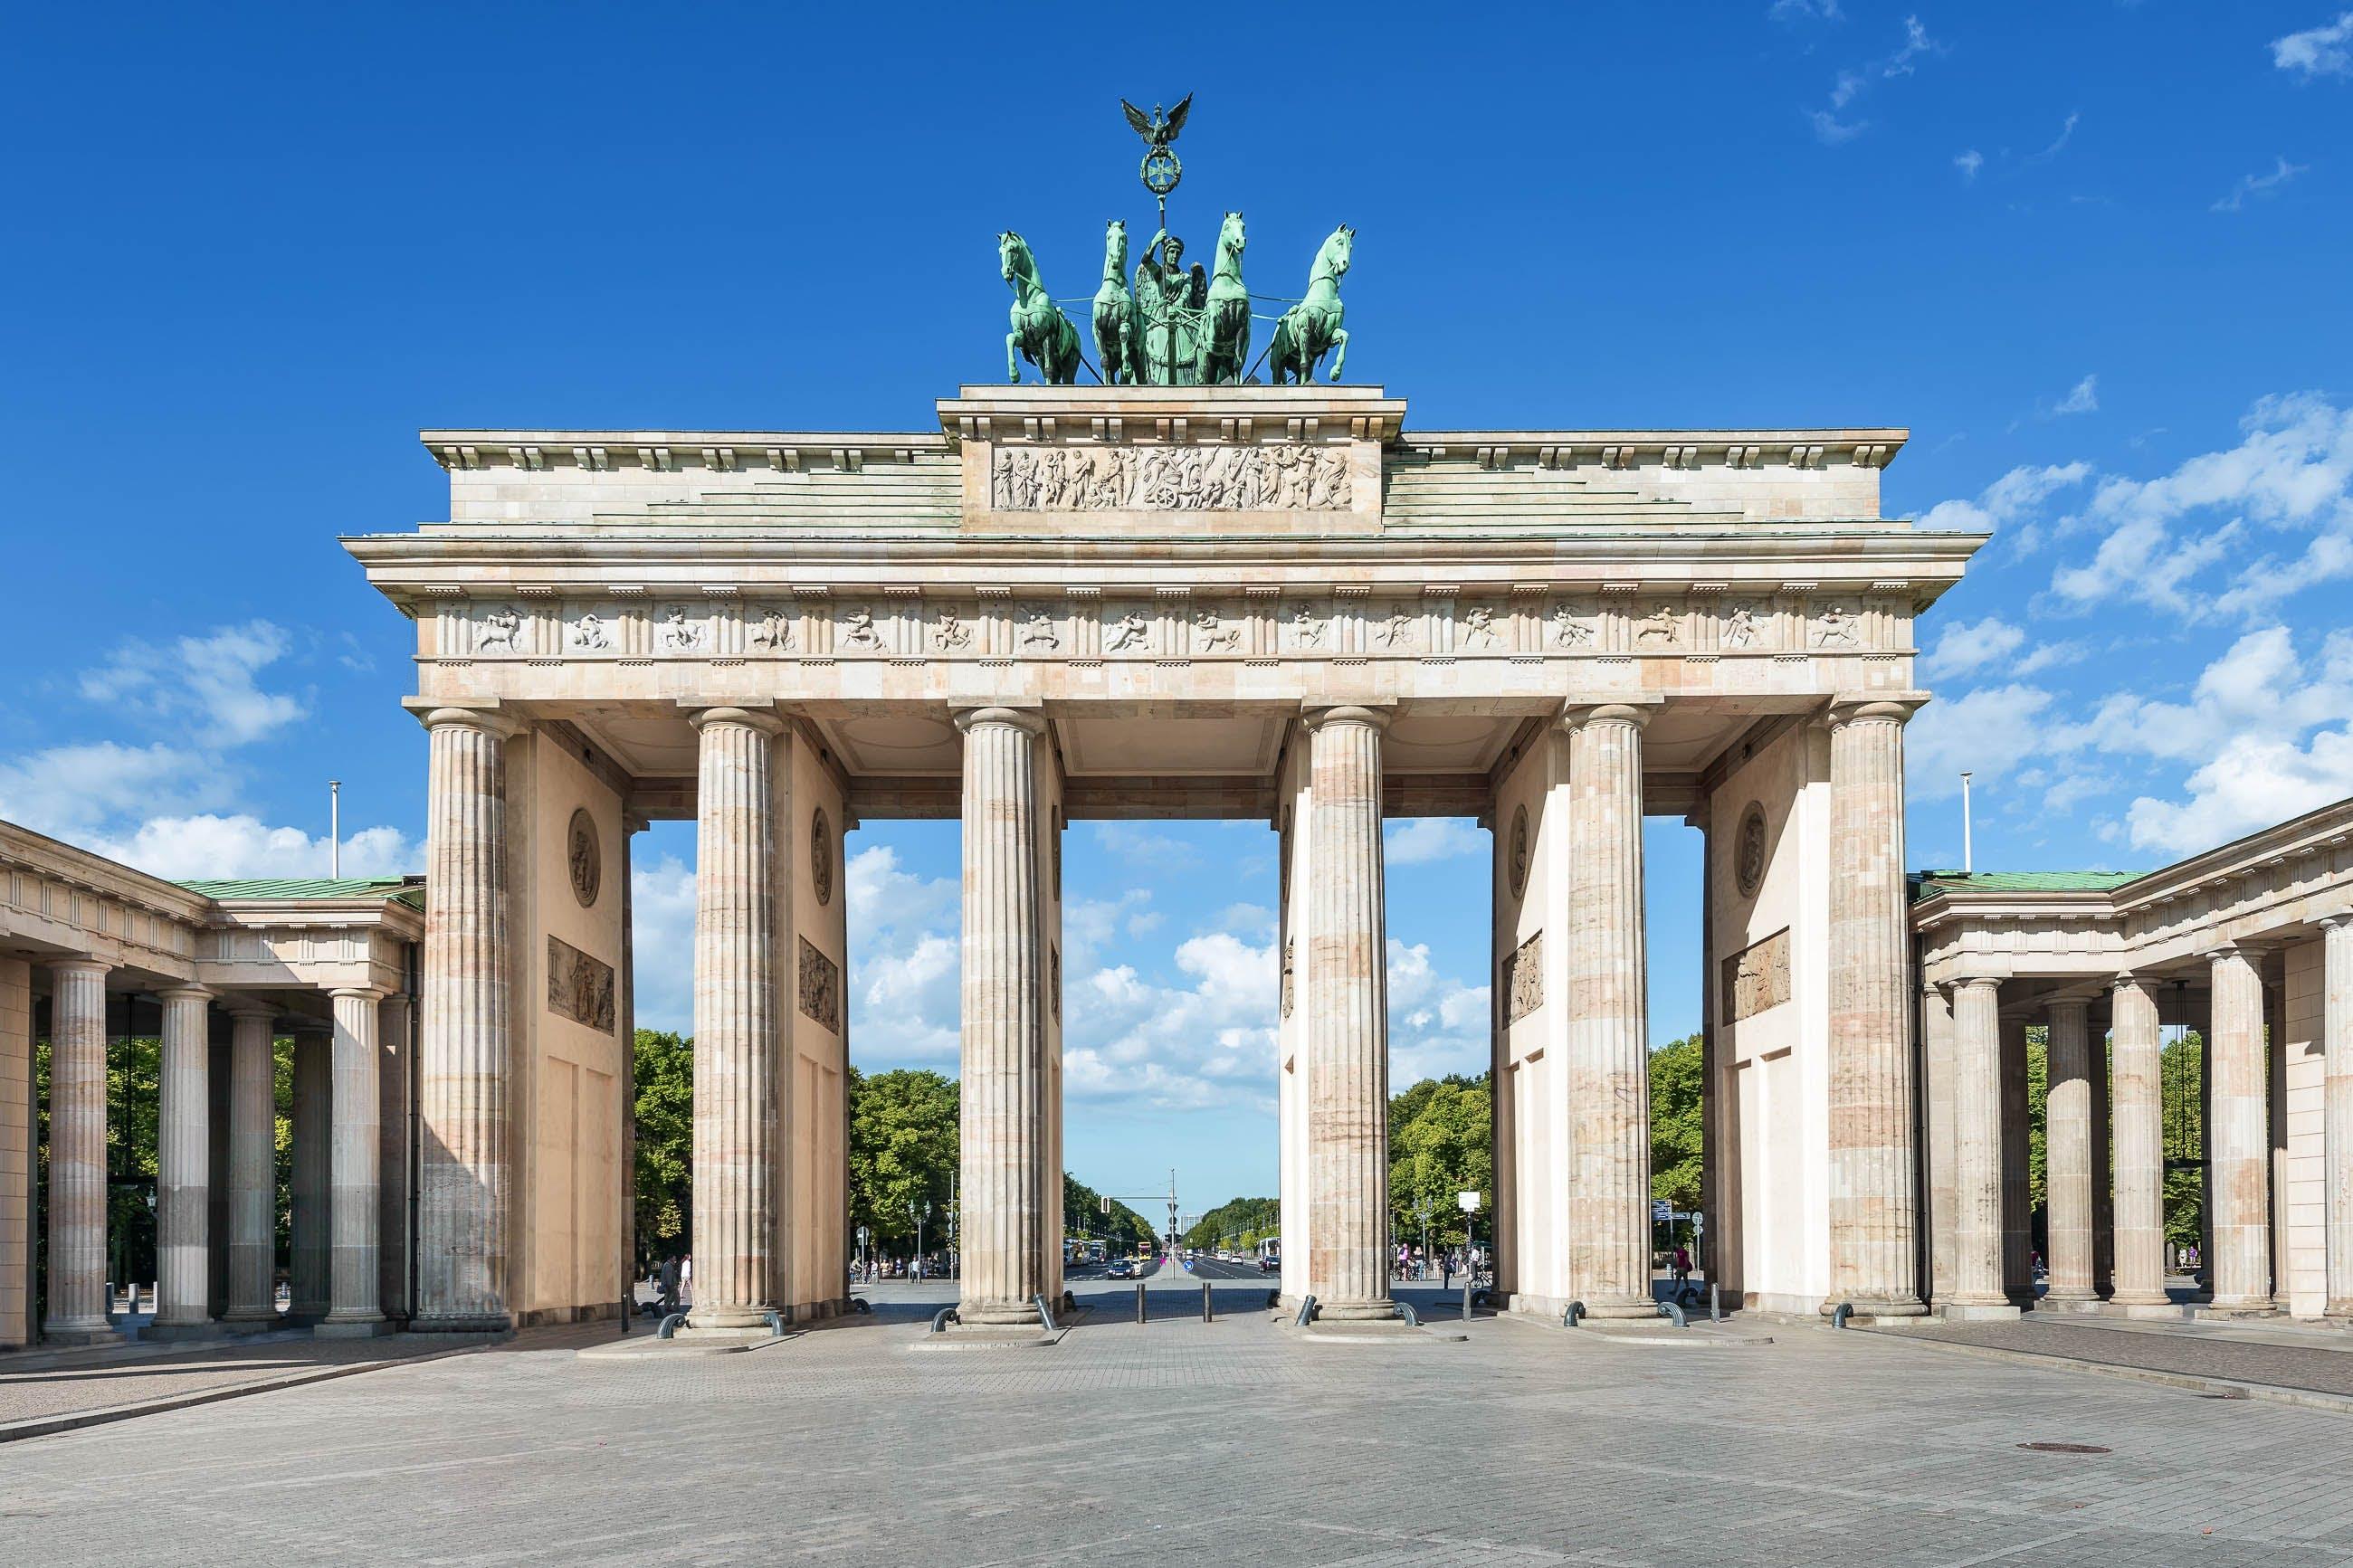 VITRONIC Berlin